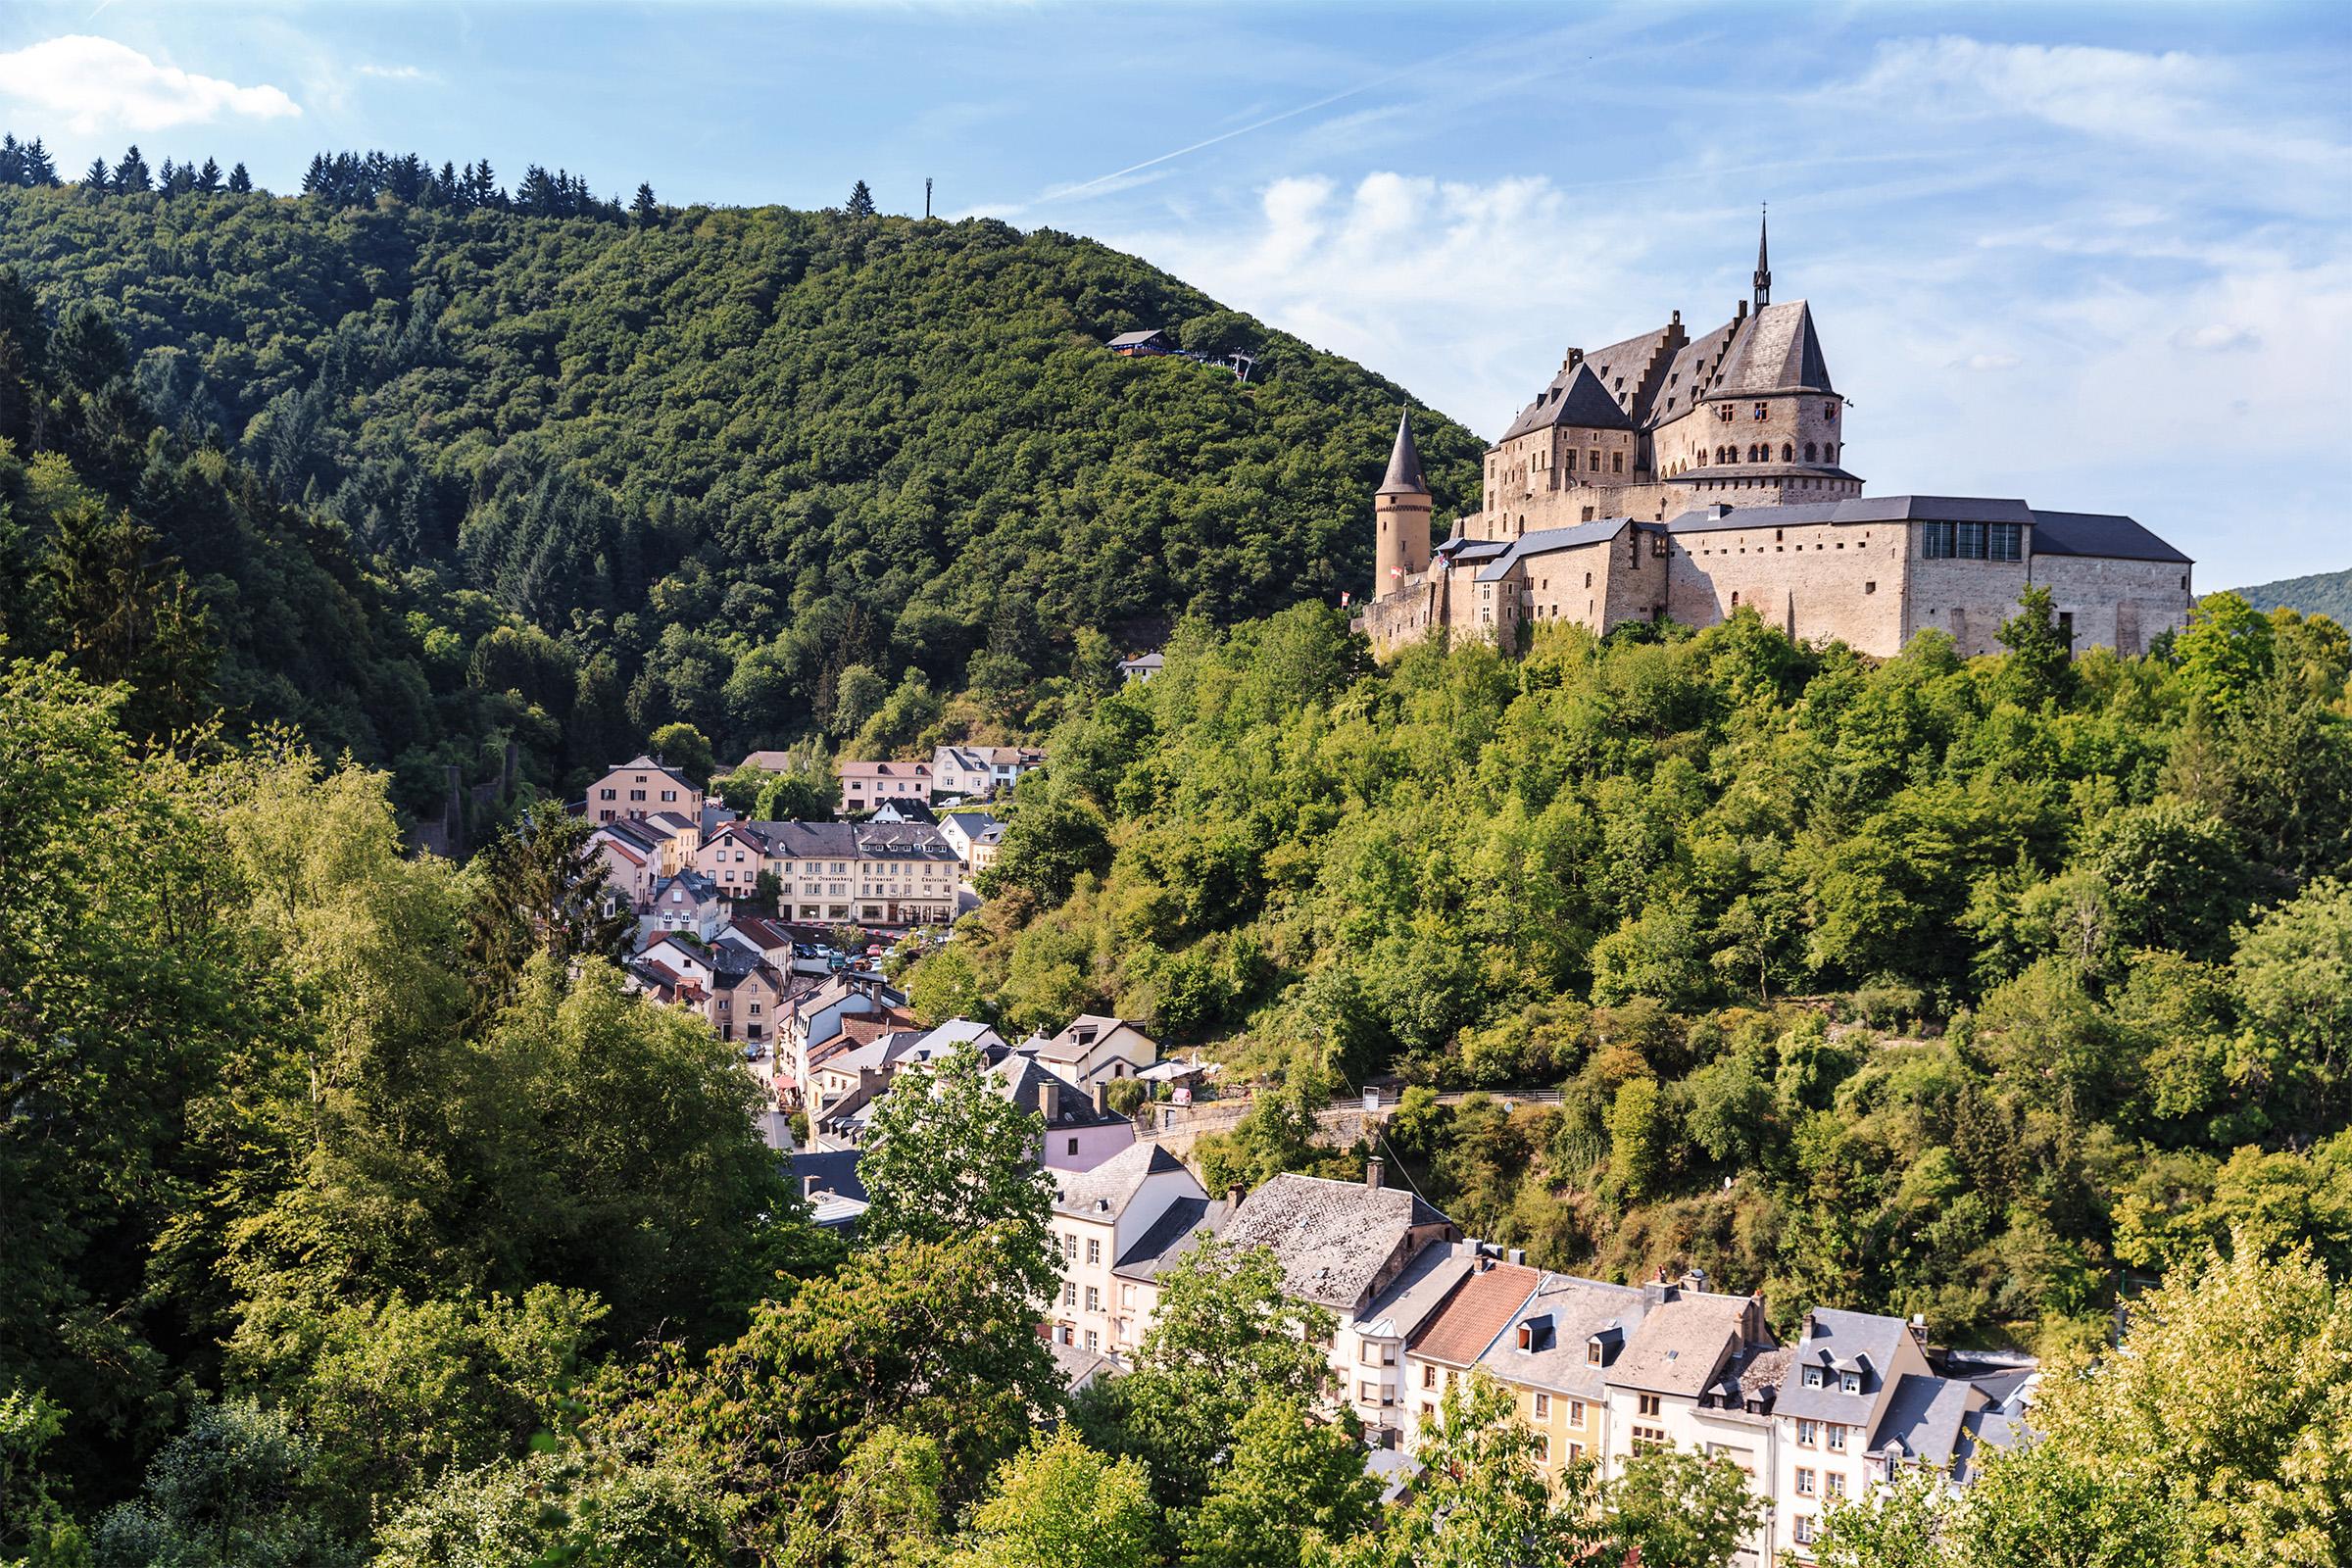 Vianden castle and a small valley